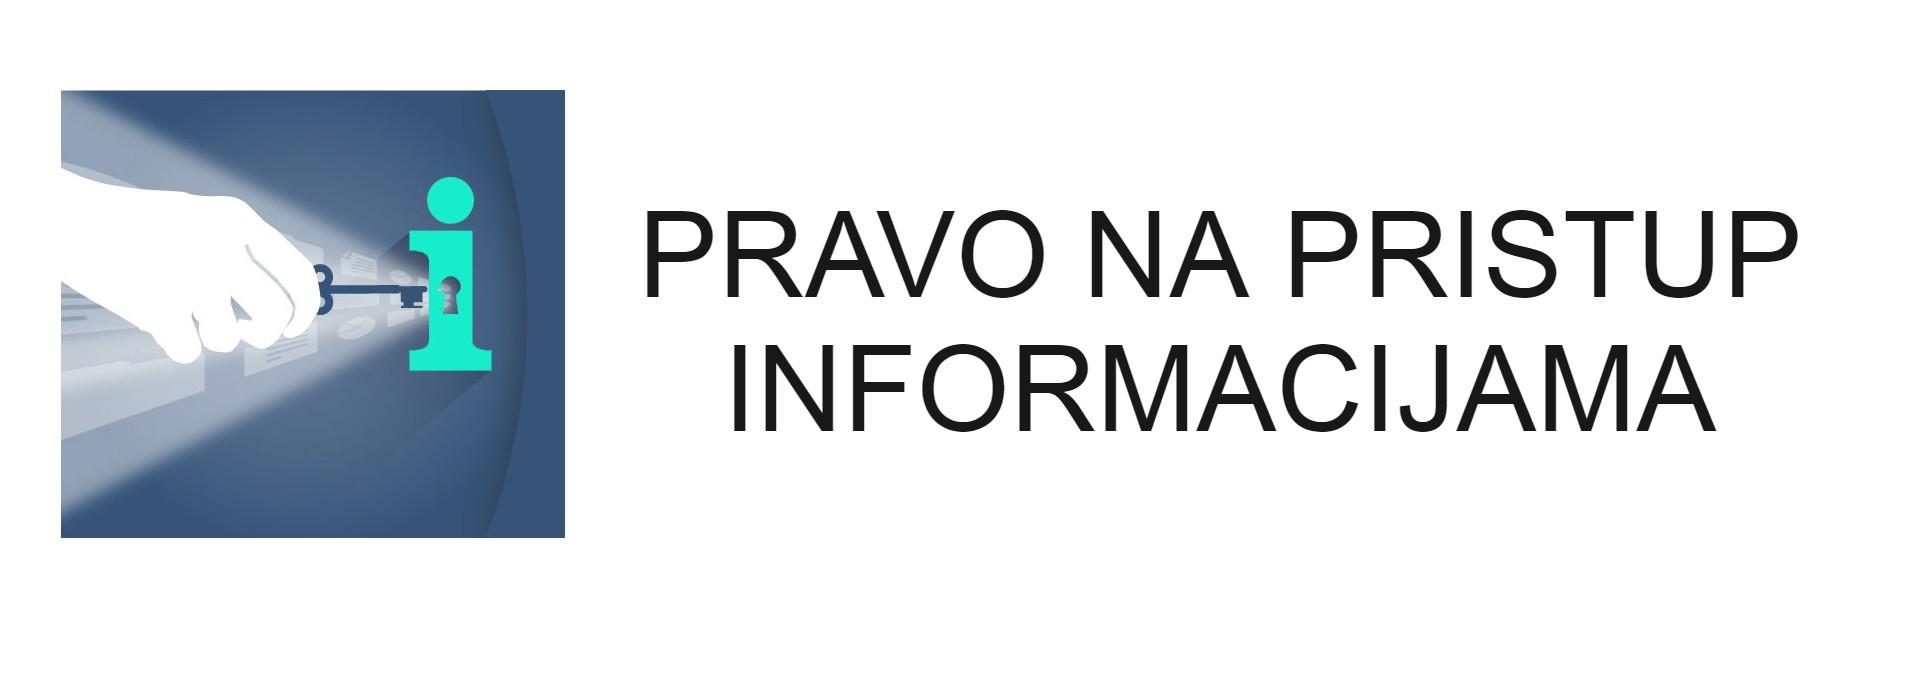 pravo na pristup informacijama banner